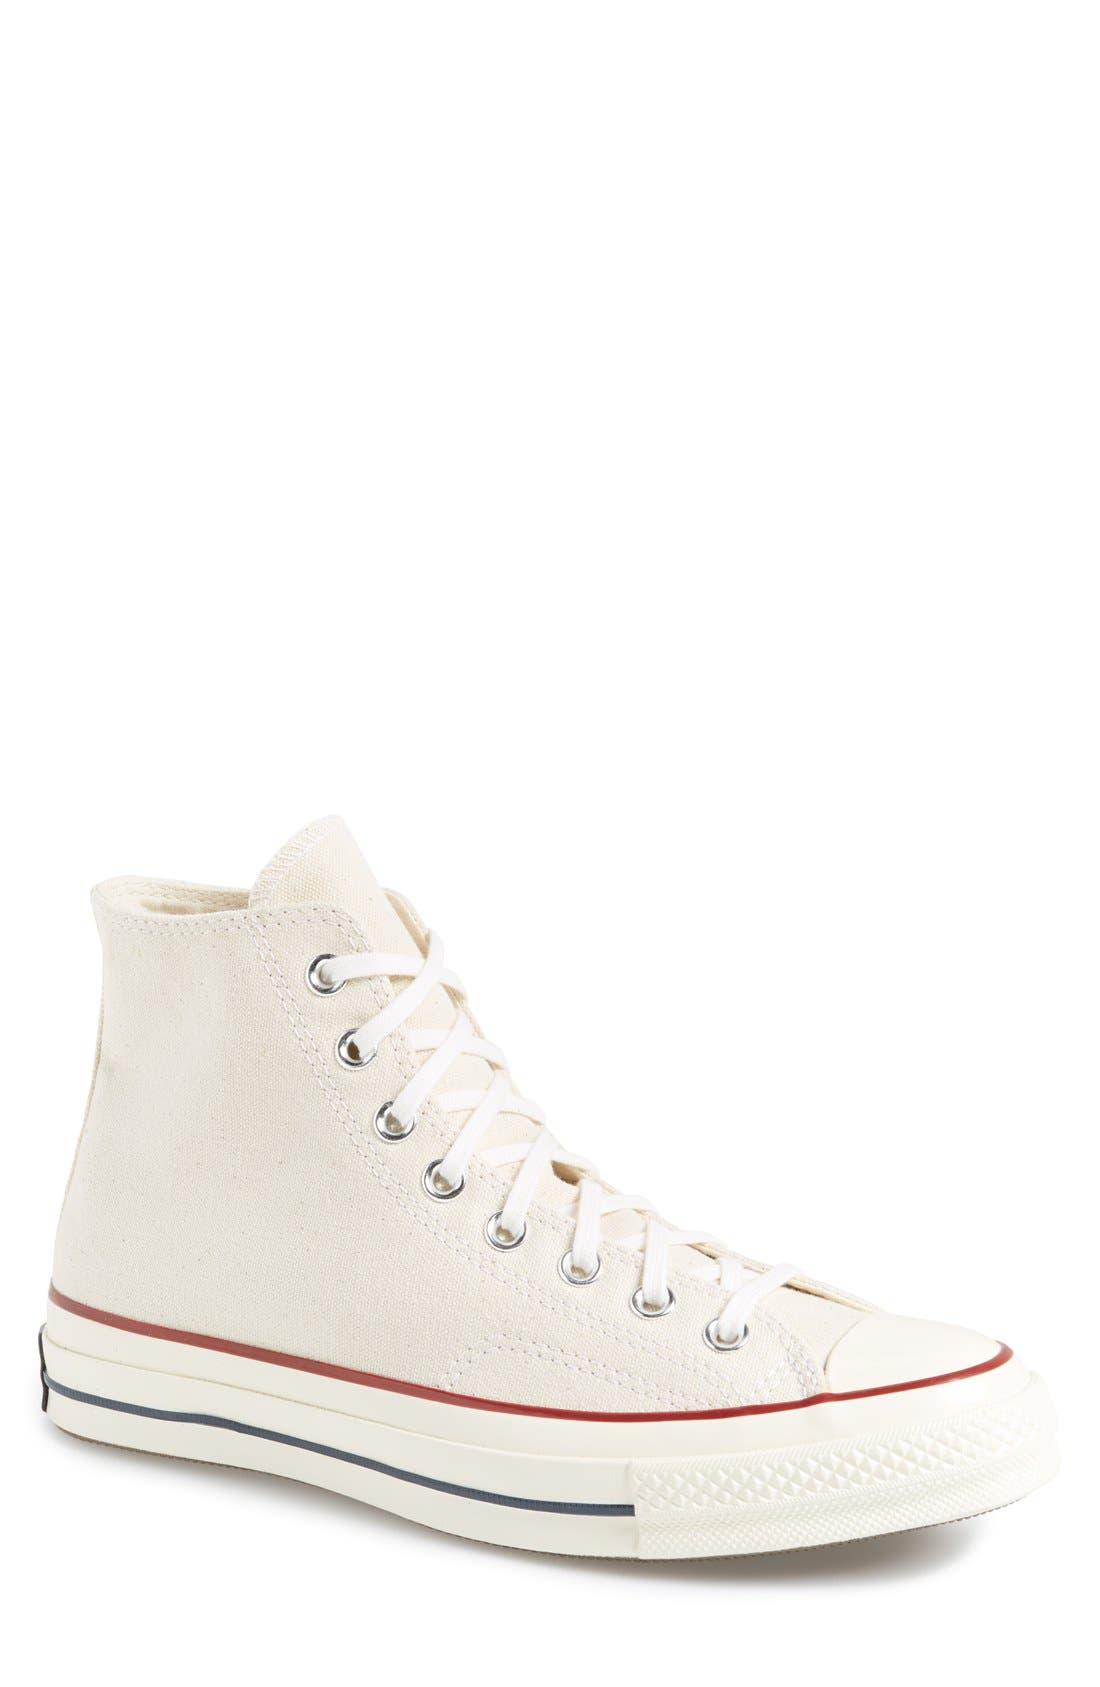 Chuck Taylor<sup>®</sup> All Star<sup>®</sup> '70 High Sneaker,                             Main thumbnail 2, color,